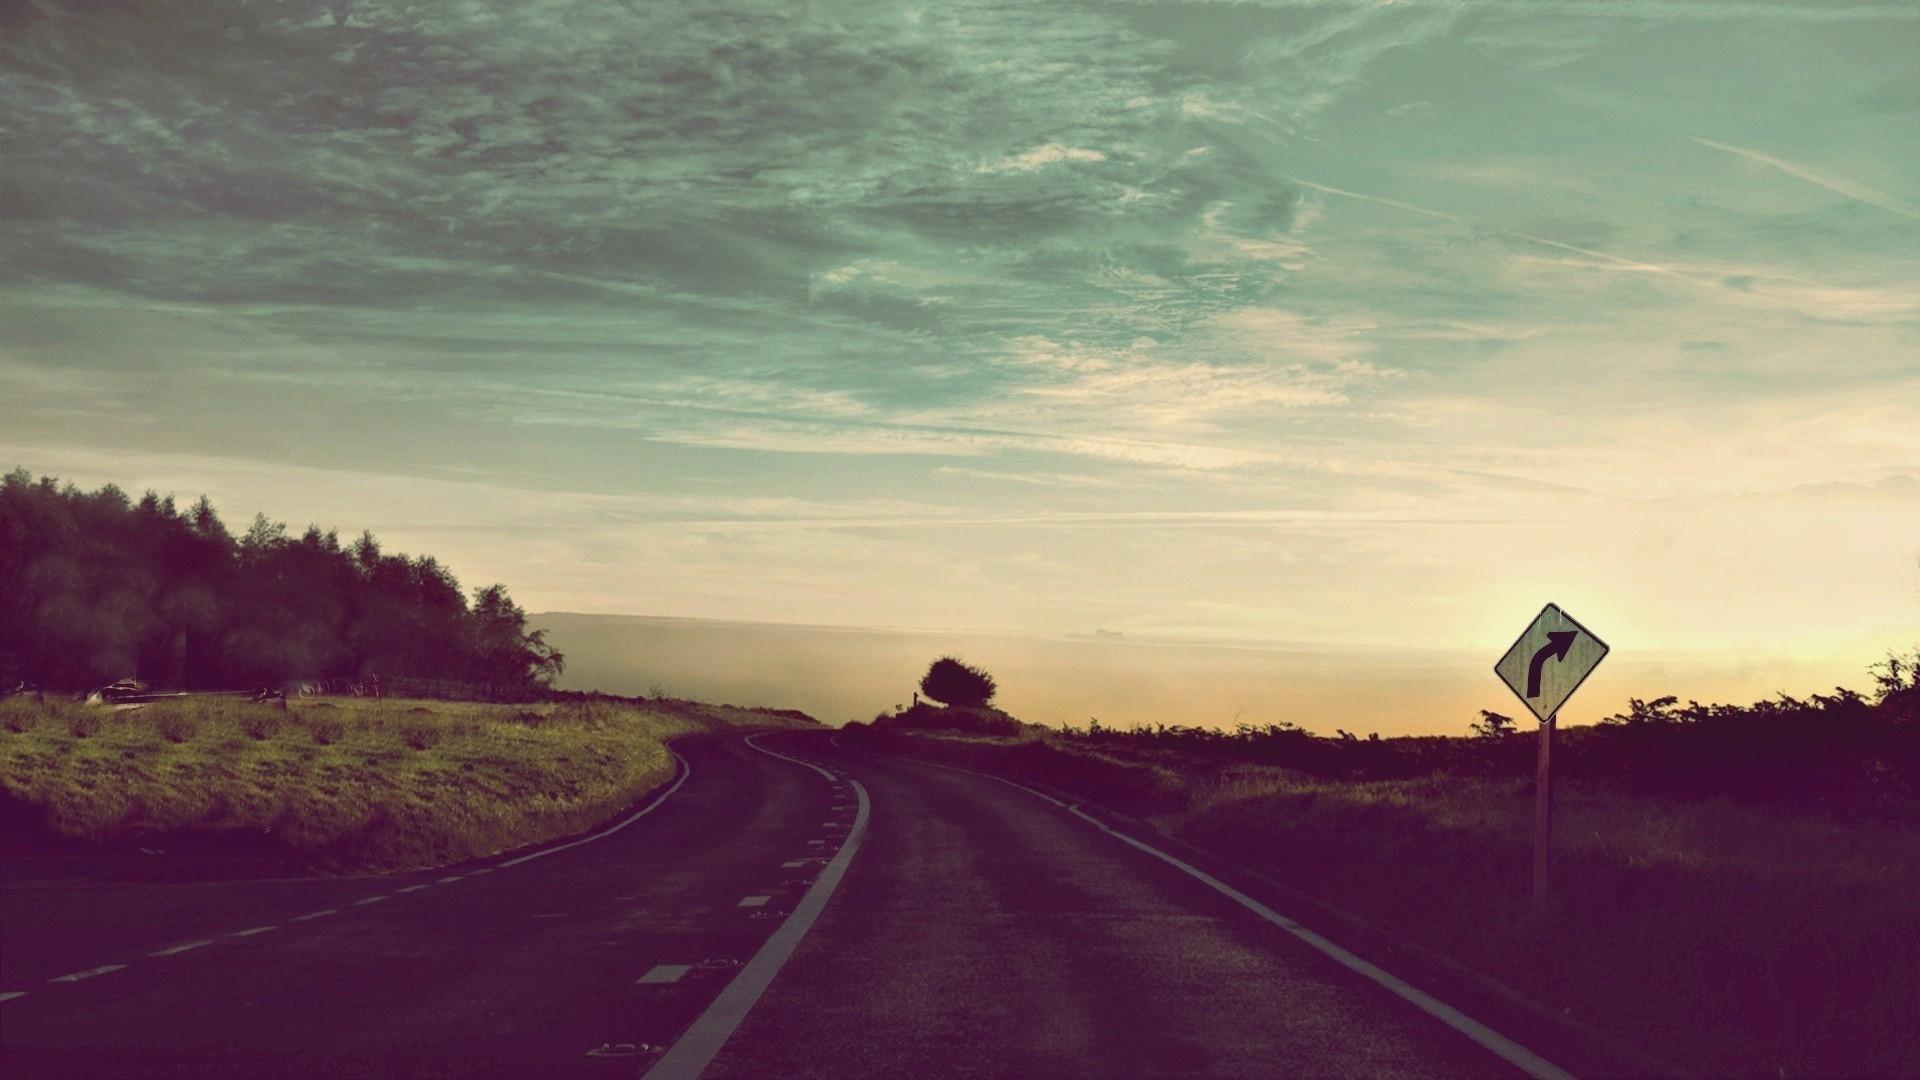 tumblr road wallpapers - download hd tumblr road s wallpaper for